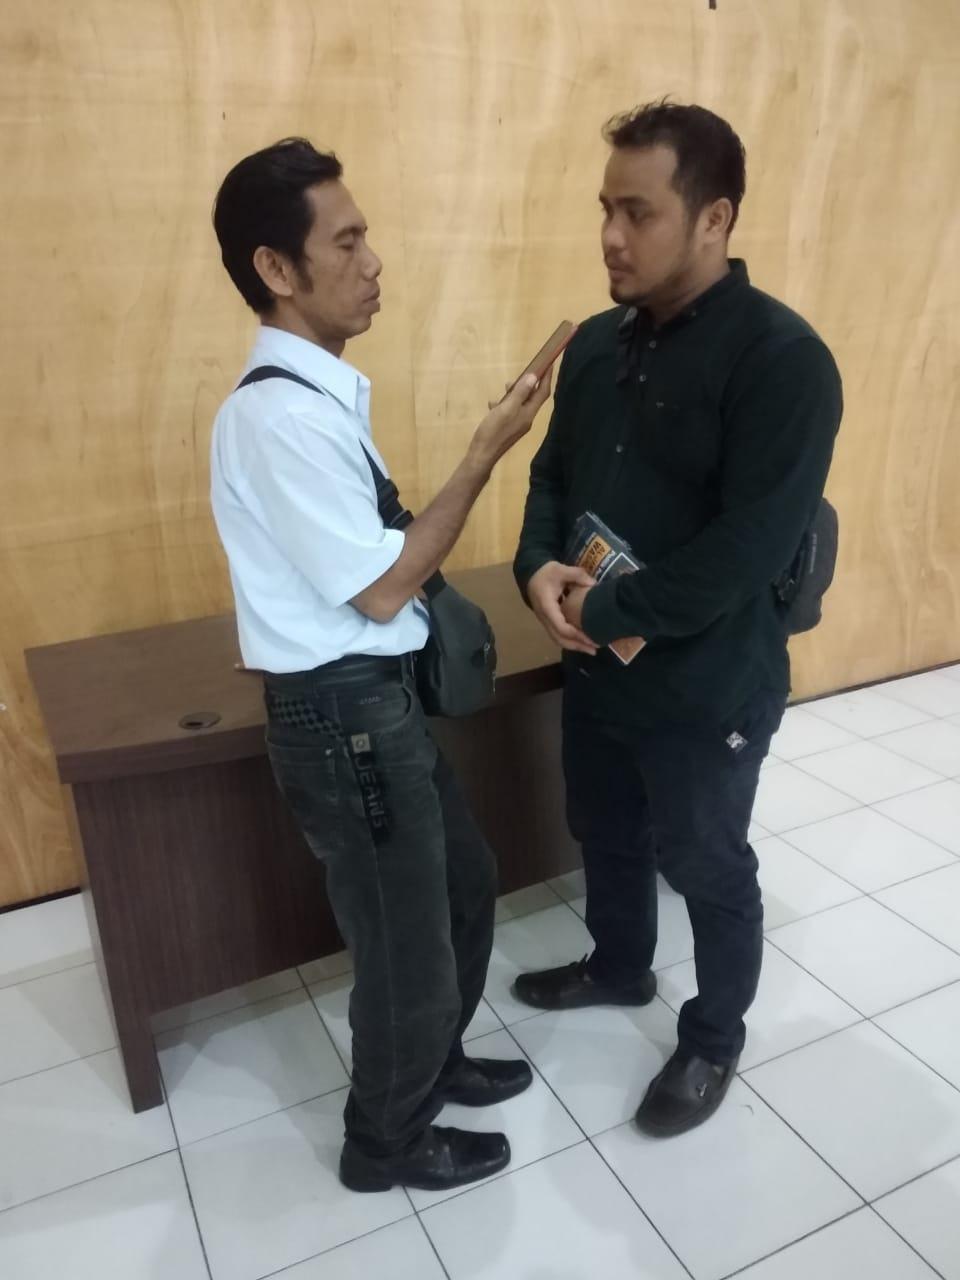 Bencana Alam atau Ilegal Loging, JMM Sumut: Kita Jangan Saling Menyudutkan !